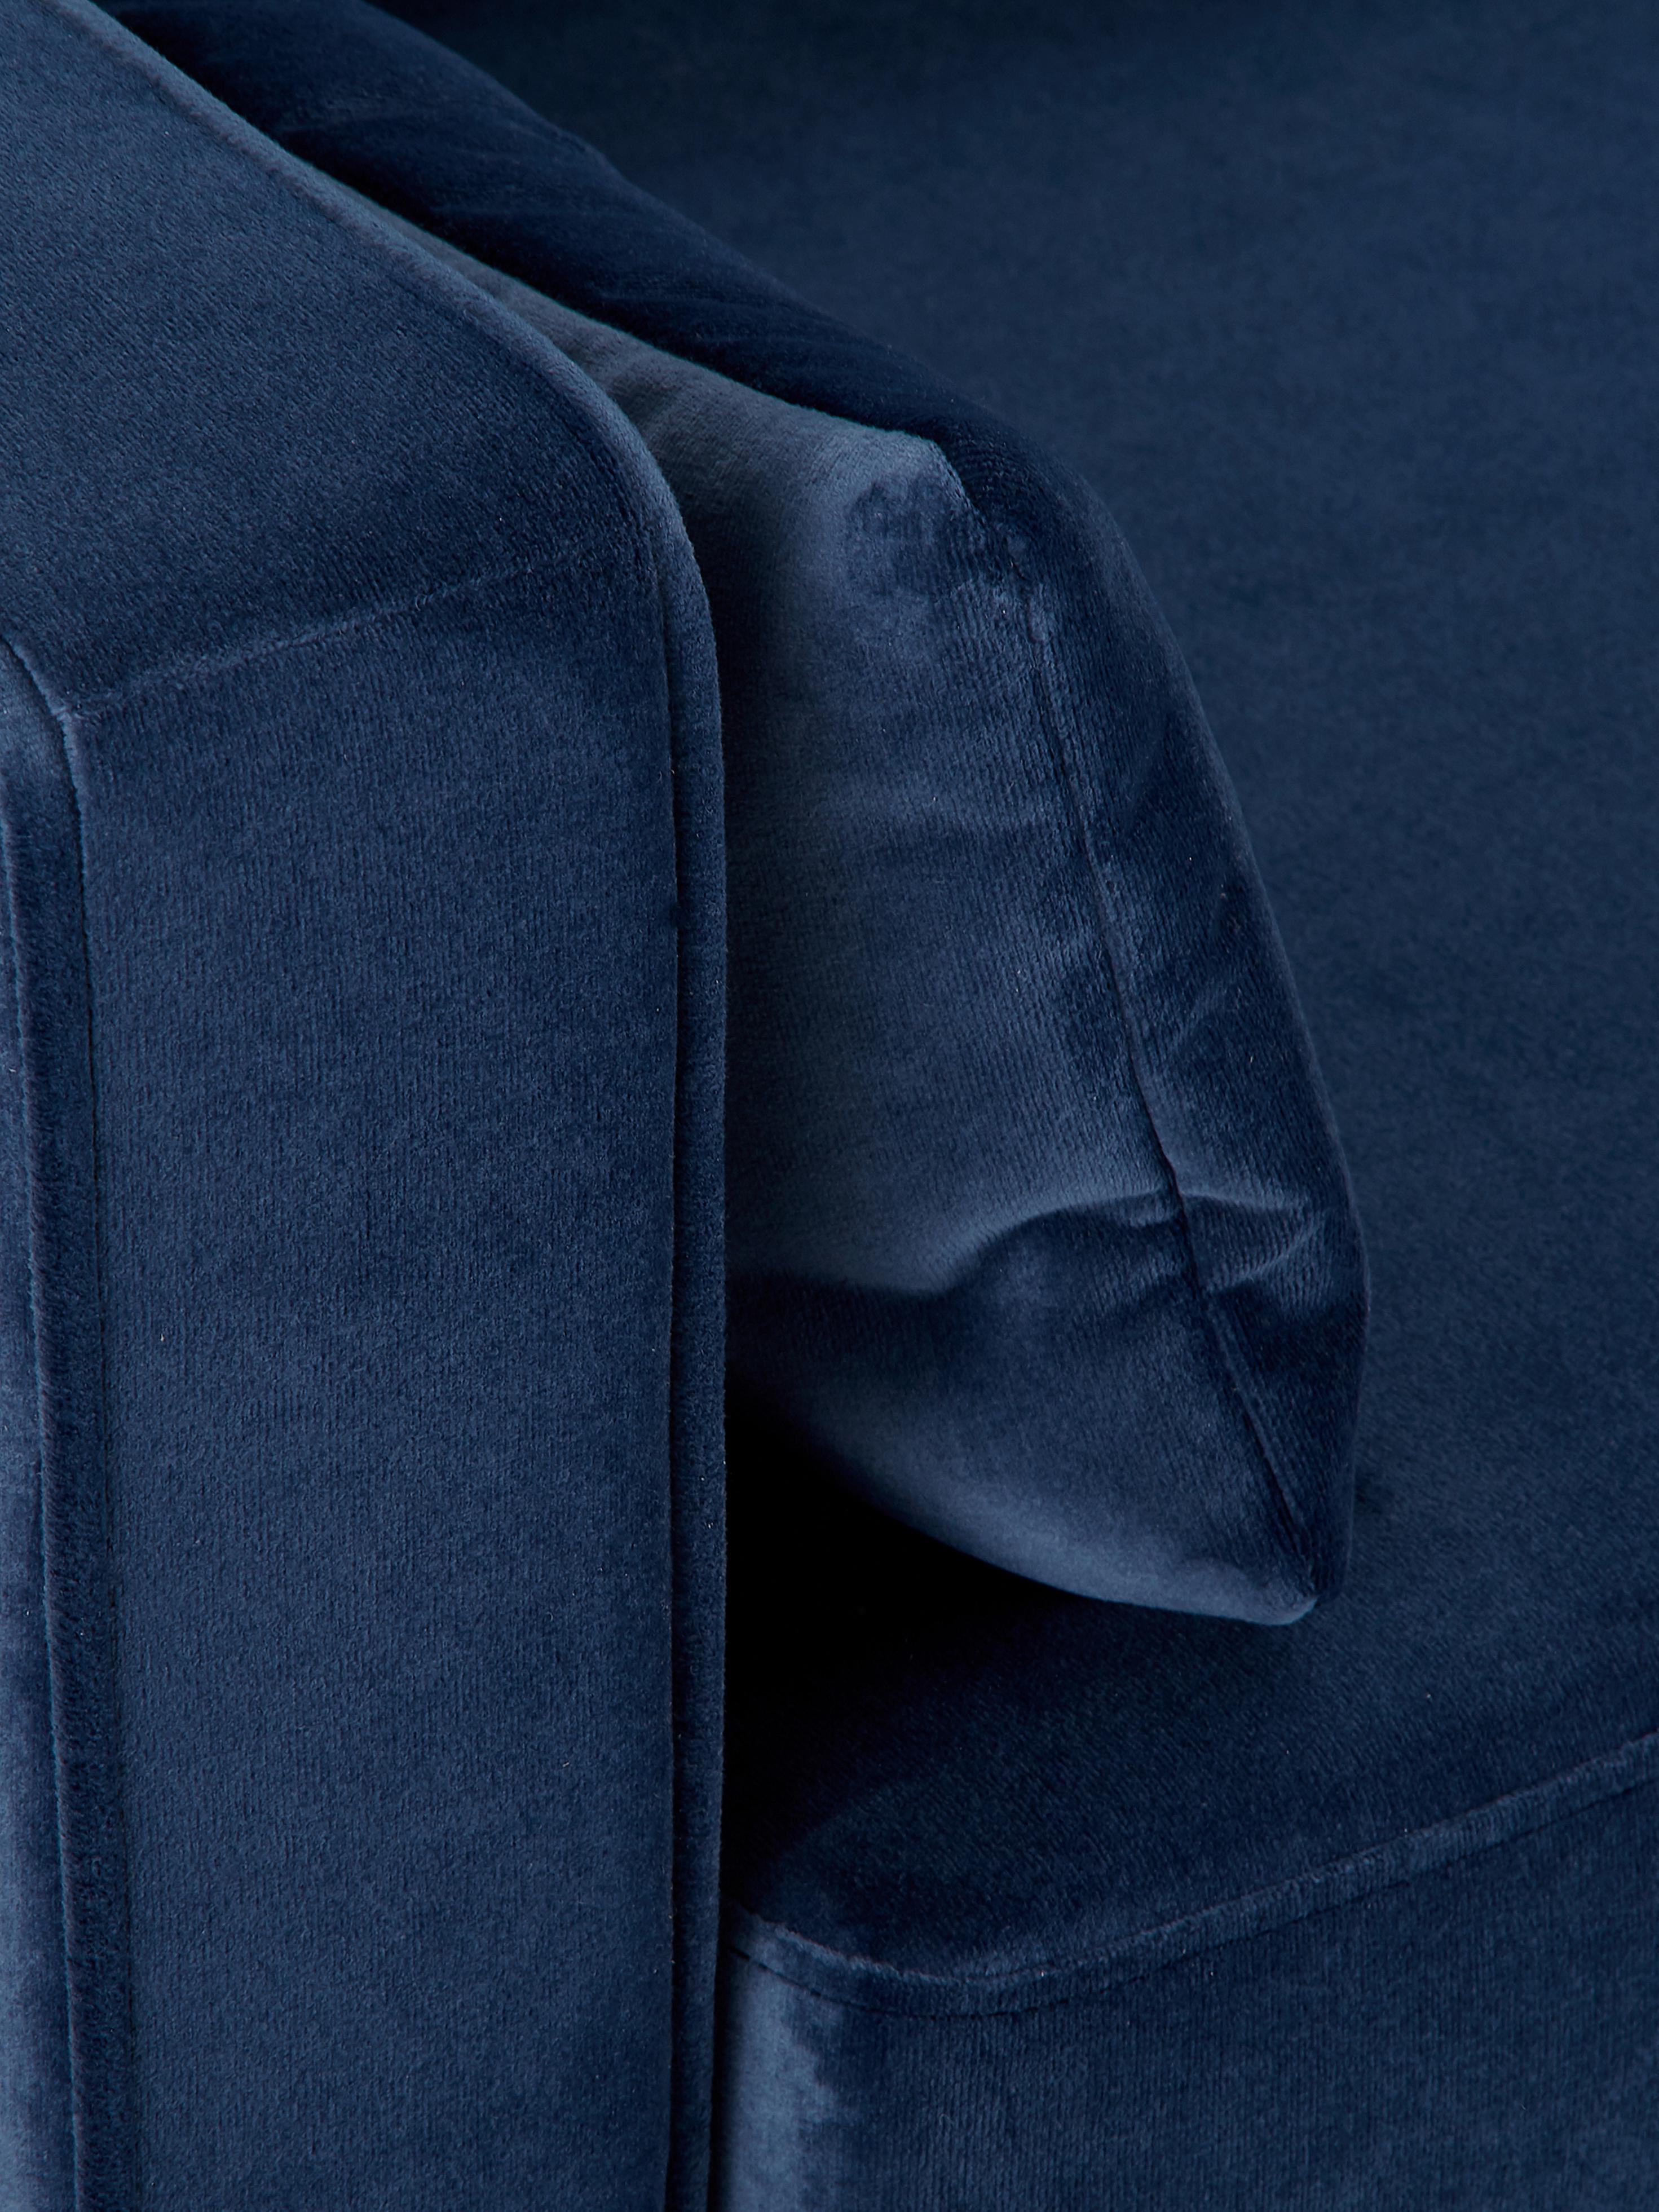 Samt-Sofa Alva (2-Sitzer), Bezug: Samt (Hochwertiger Polyes, Gestell: Massives Kiefernholz, Füße: Massives Buchenholz, gebe, Samt Dunkelblau, B 184 x T 92 cm